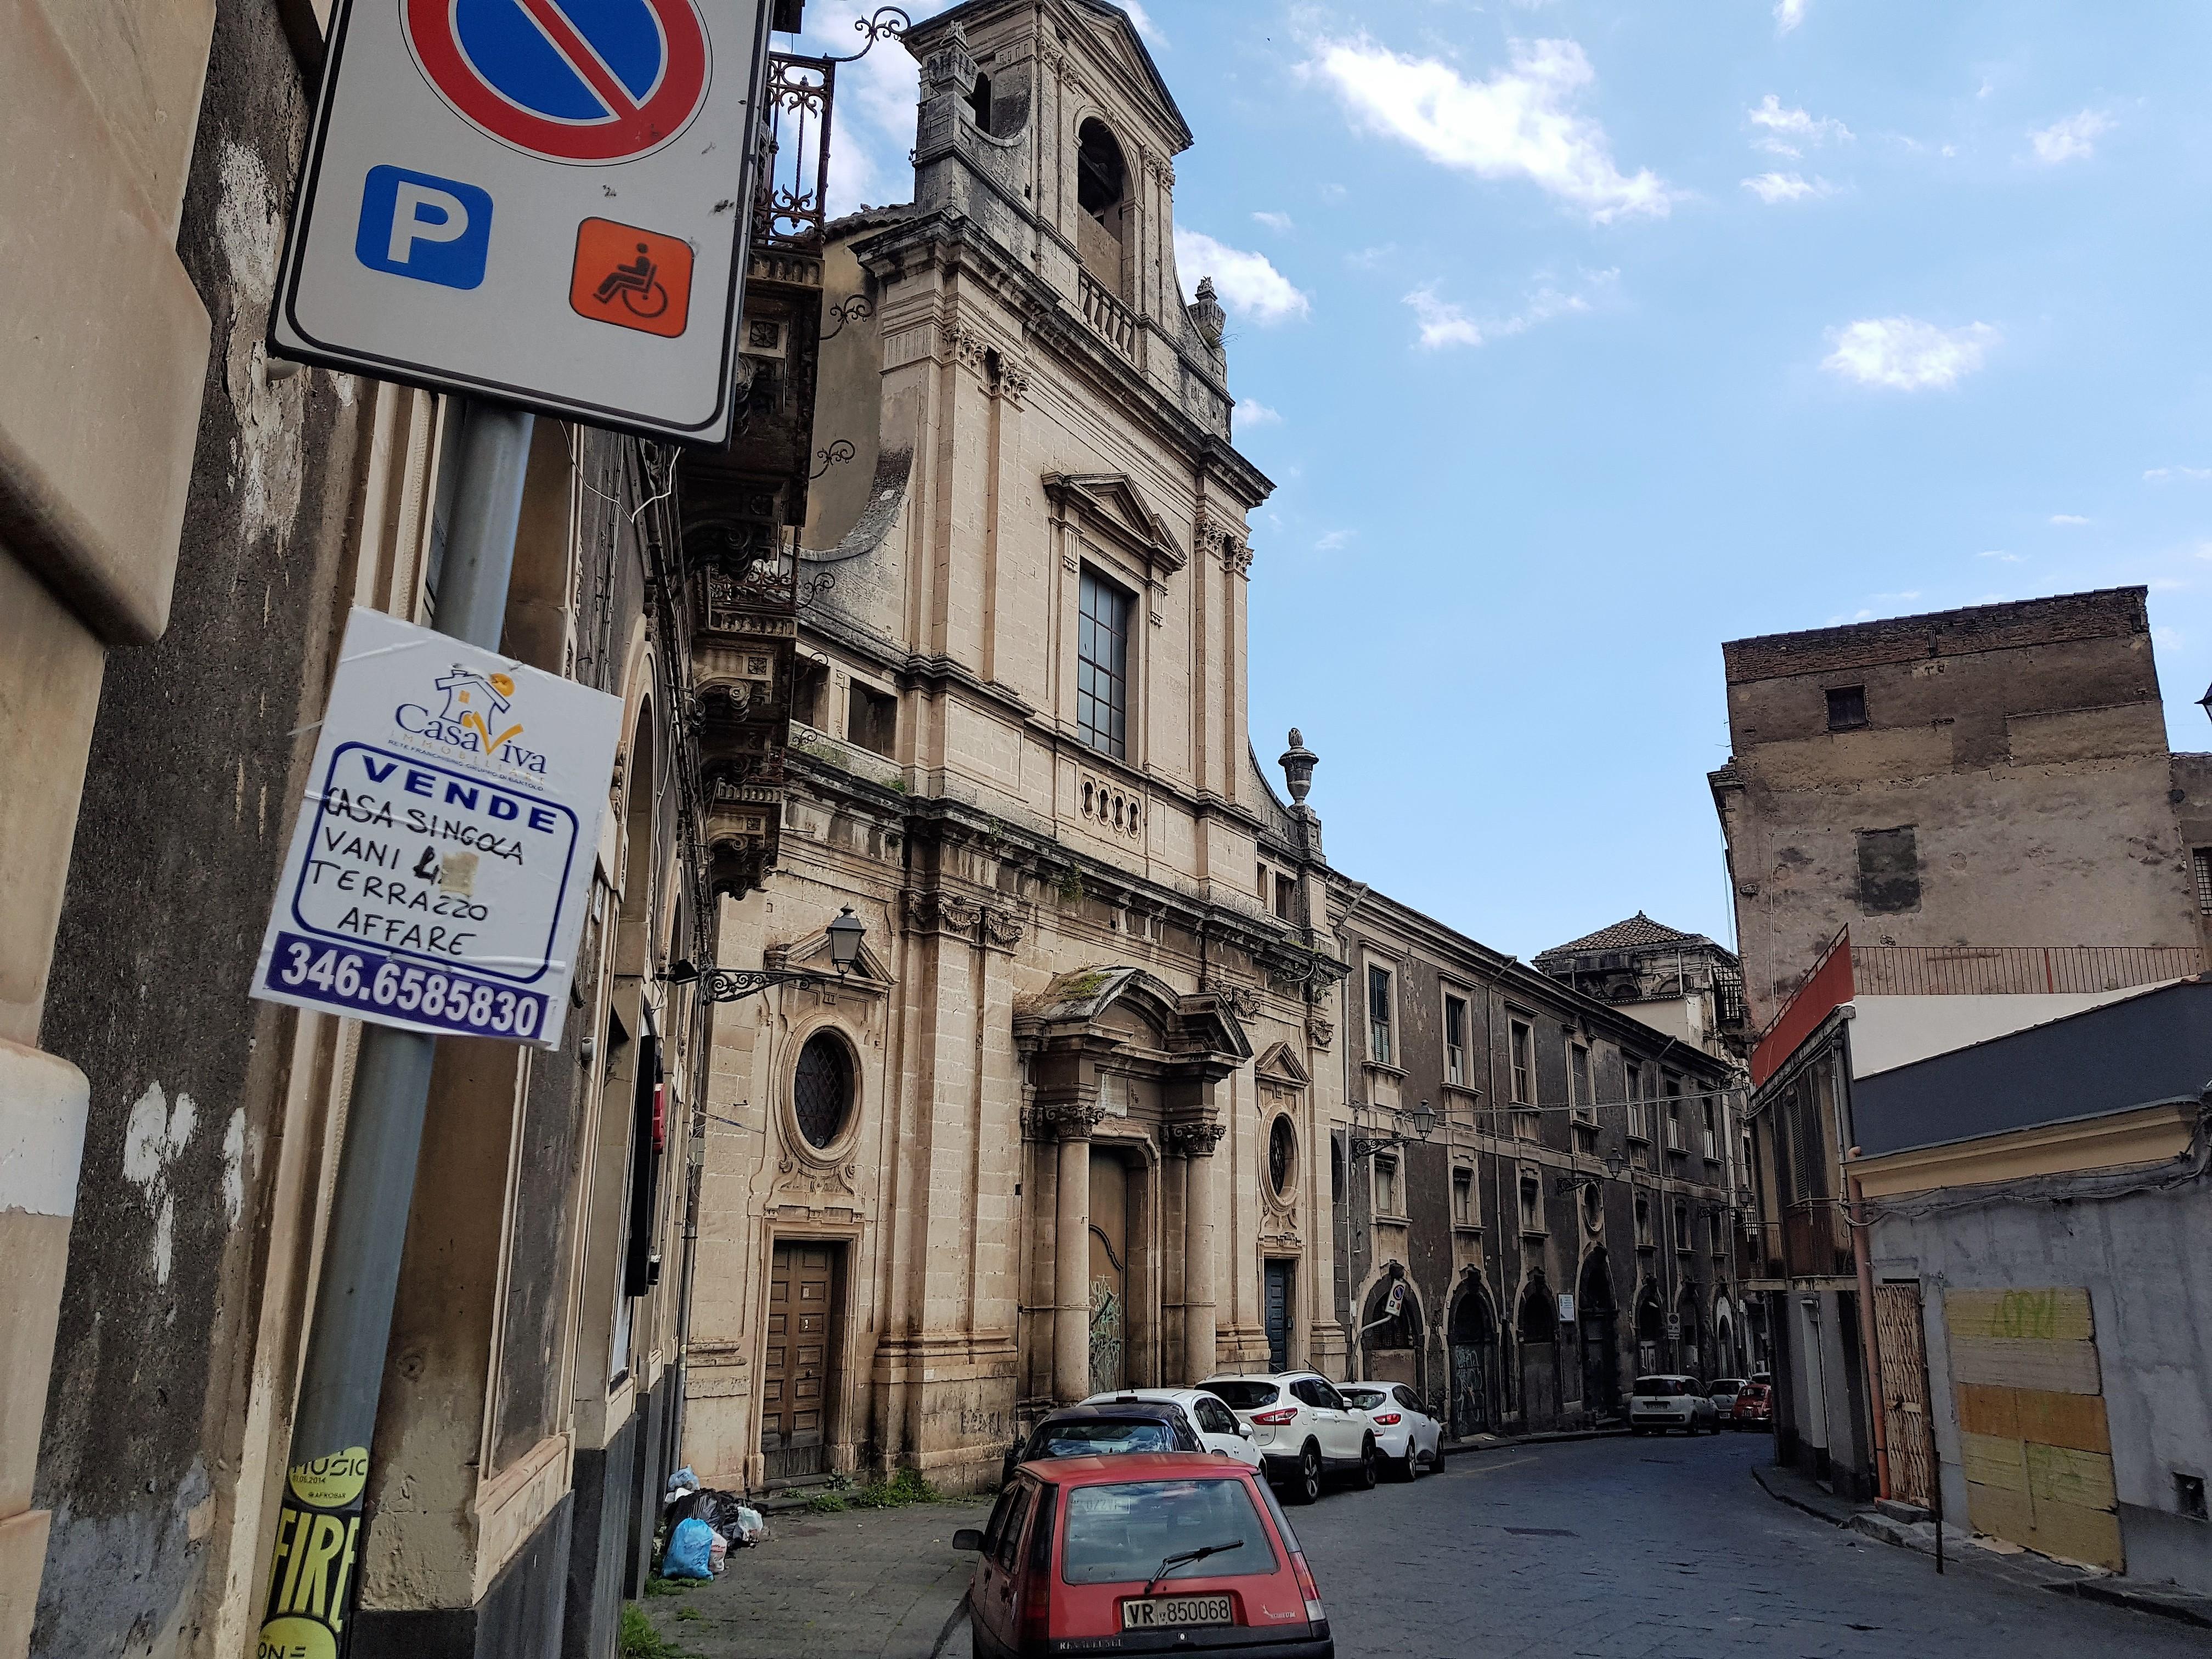 ex O.P. Reclusorio delle Vergini (Collegio Santa Venera)